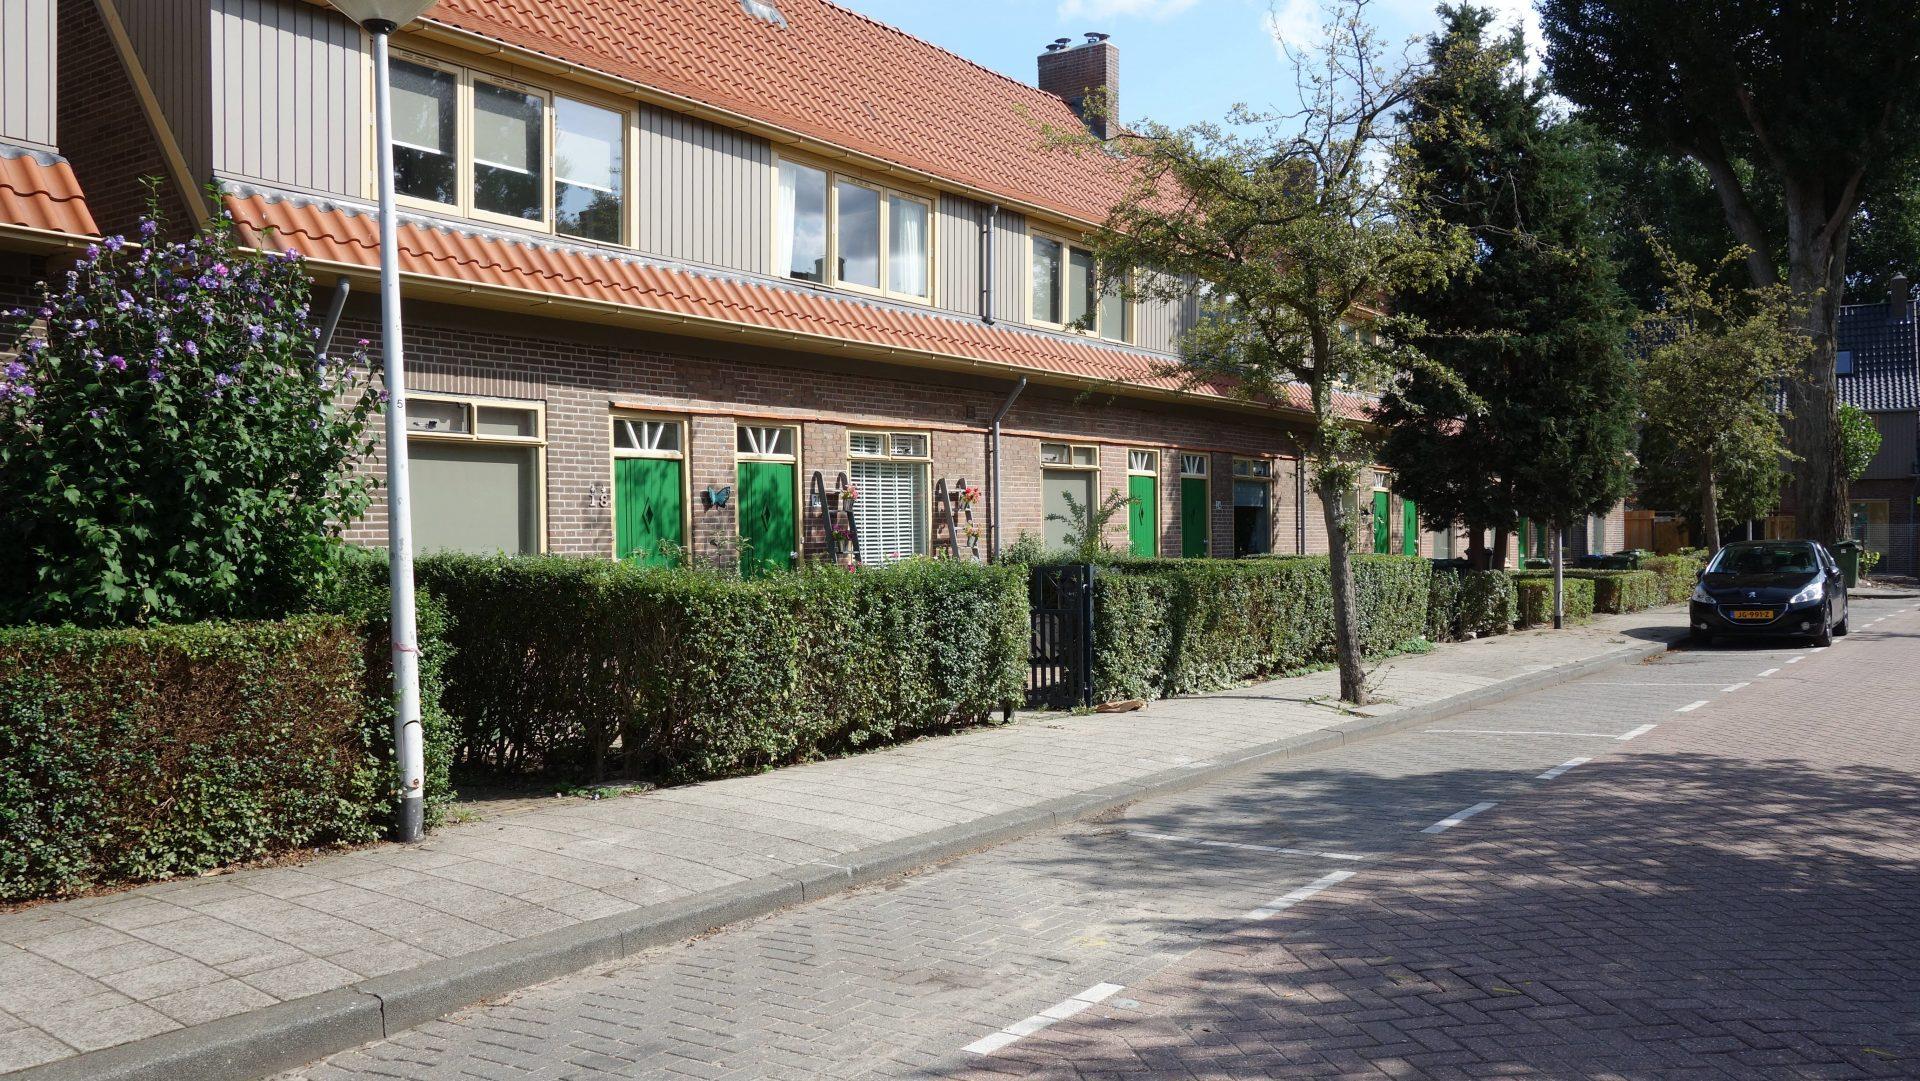 Renewal Tuindorp Vreewijk, Rotterdam